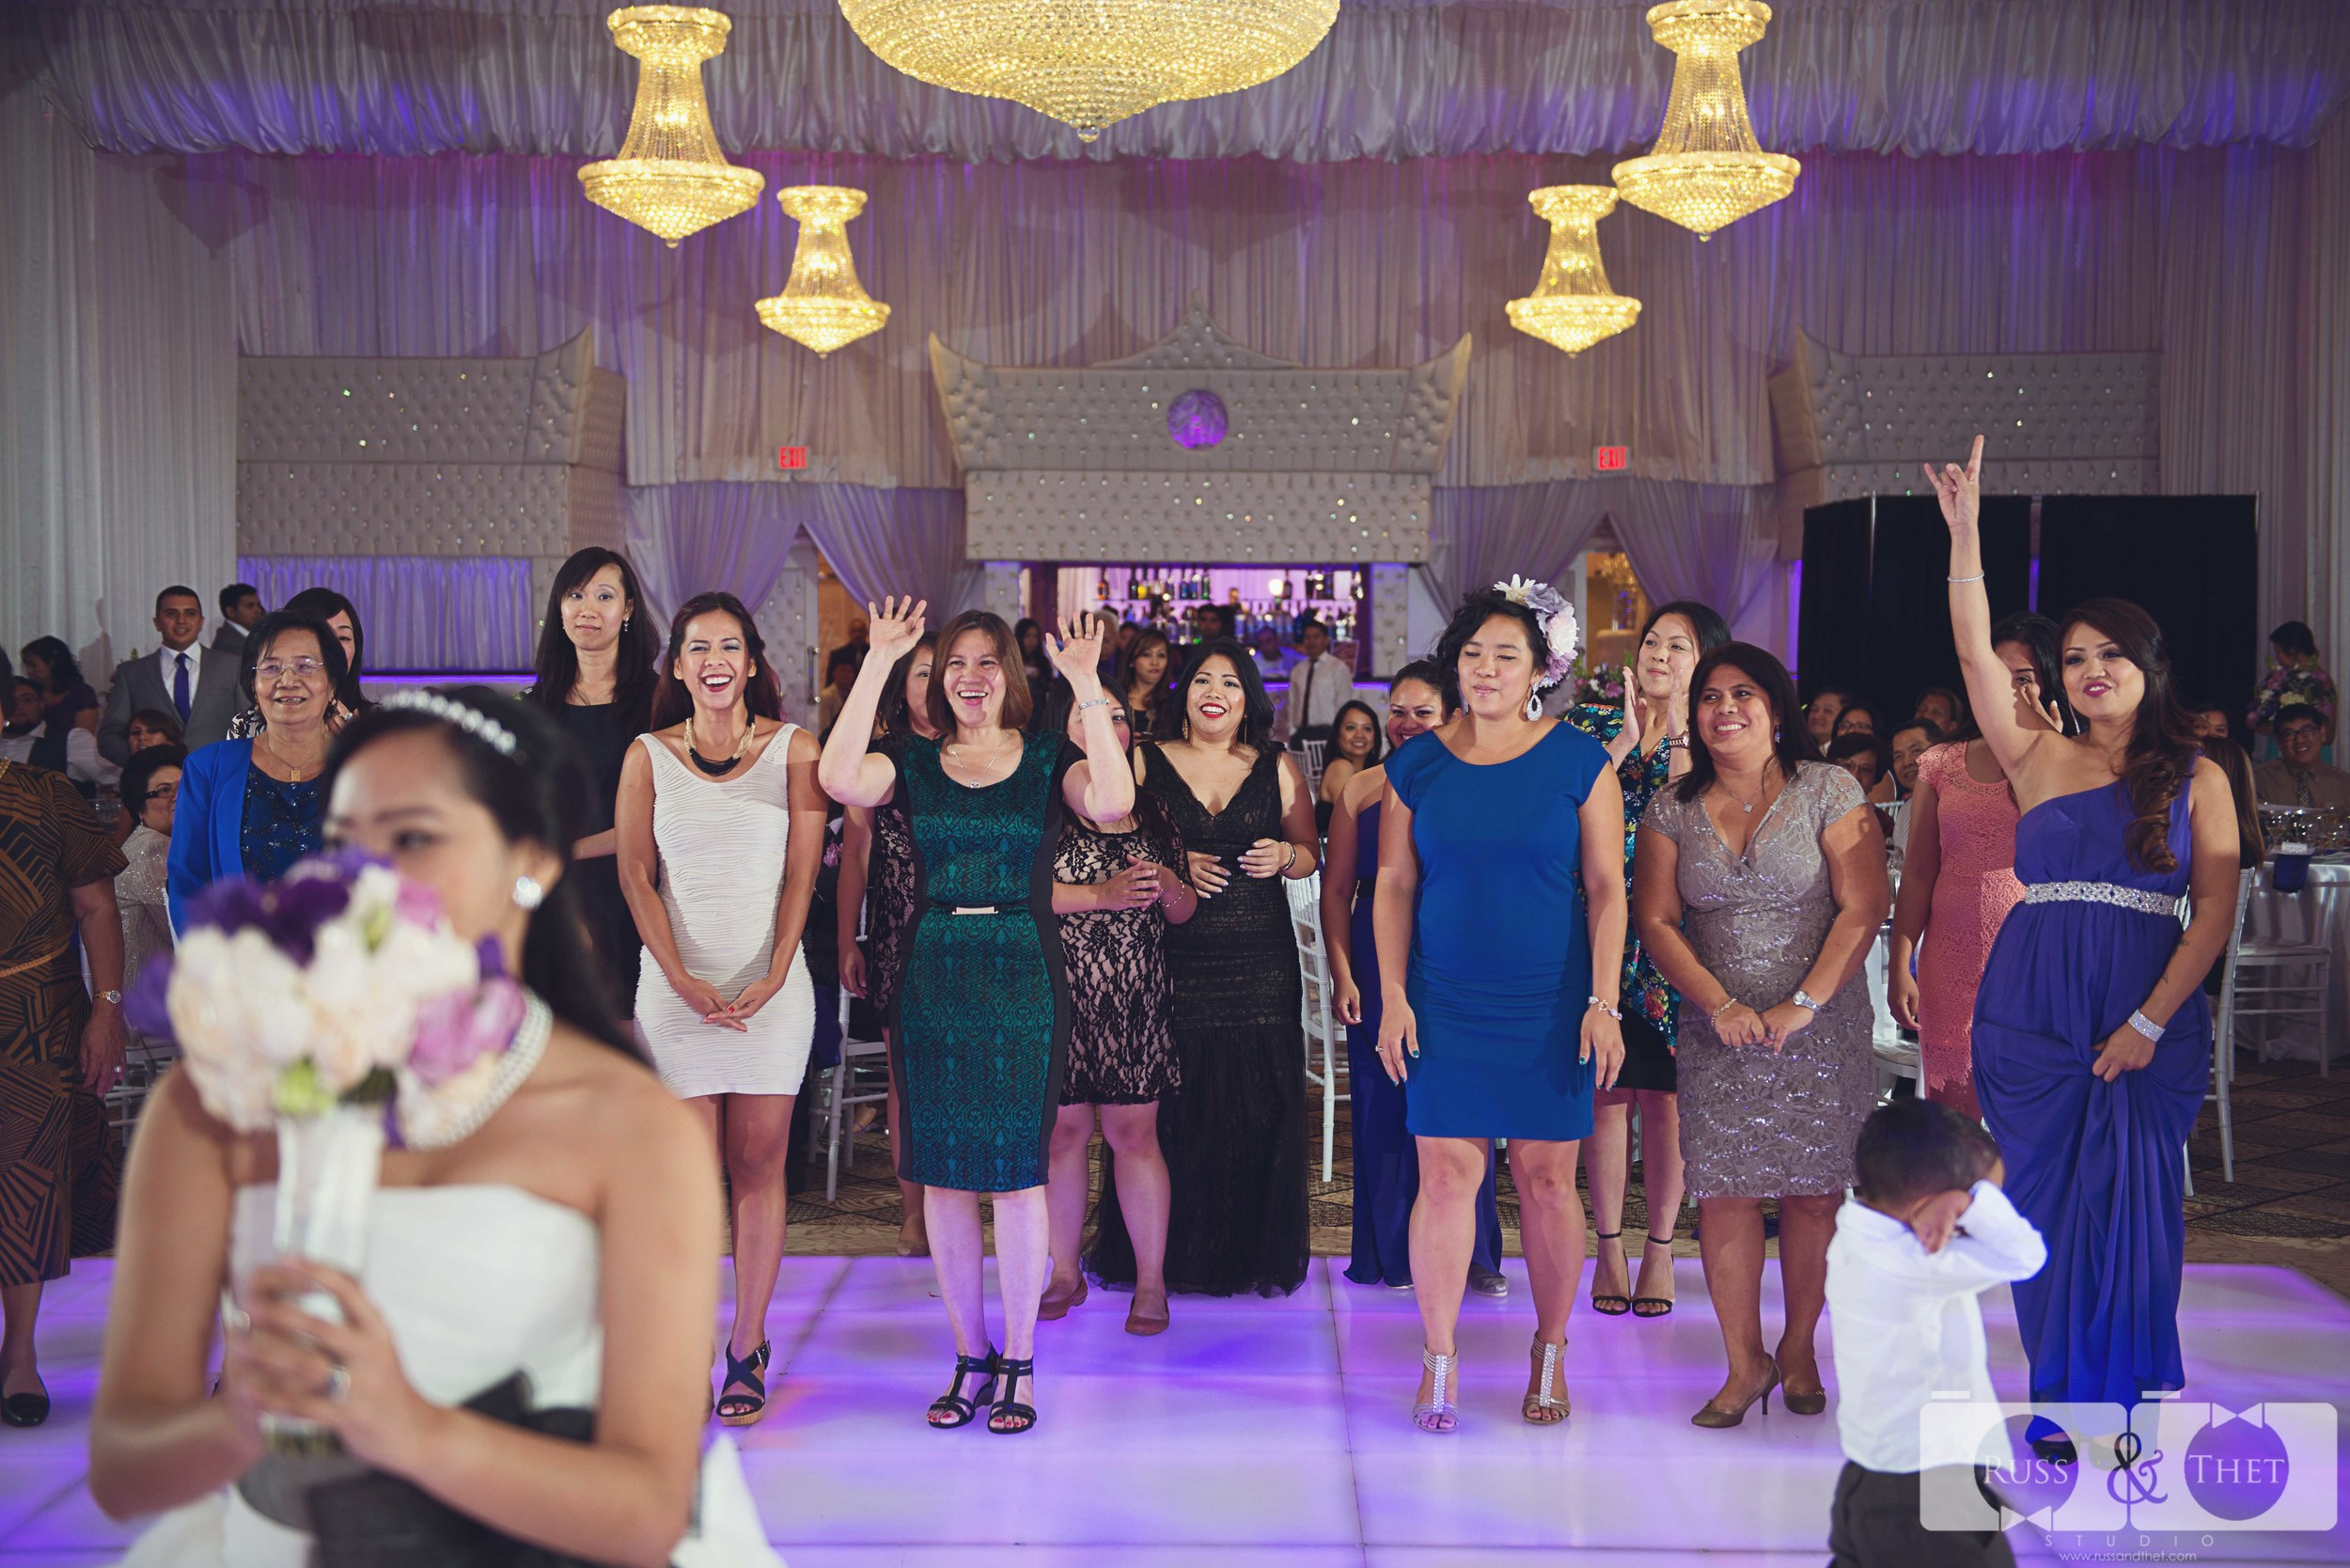 royal-palace-banquet-hall-glendale-wedding-68.JPG